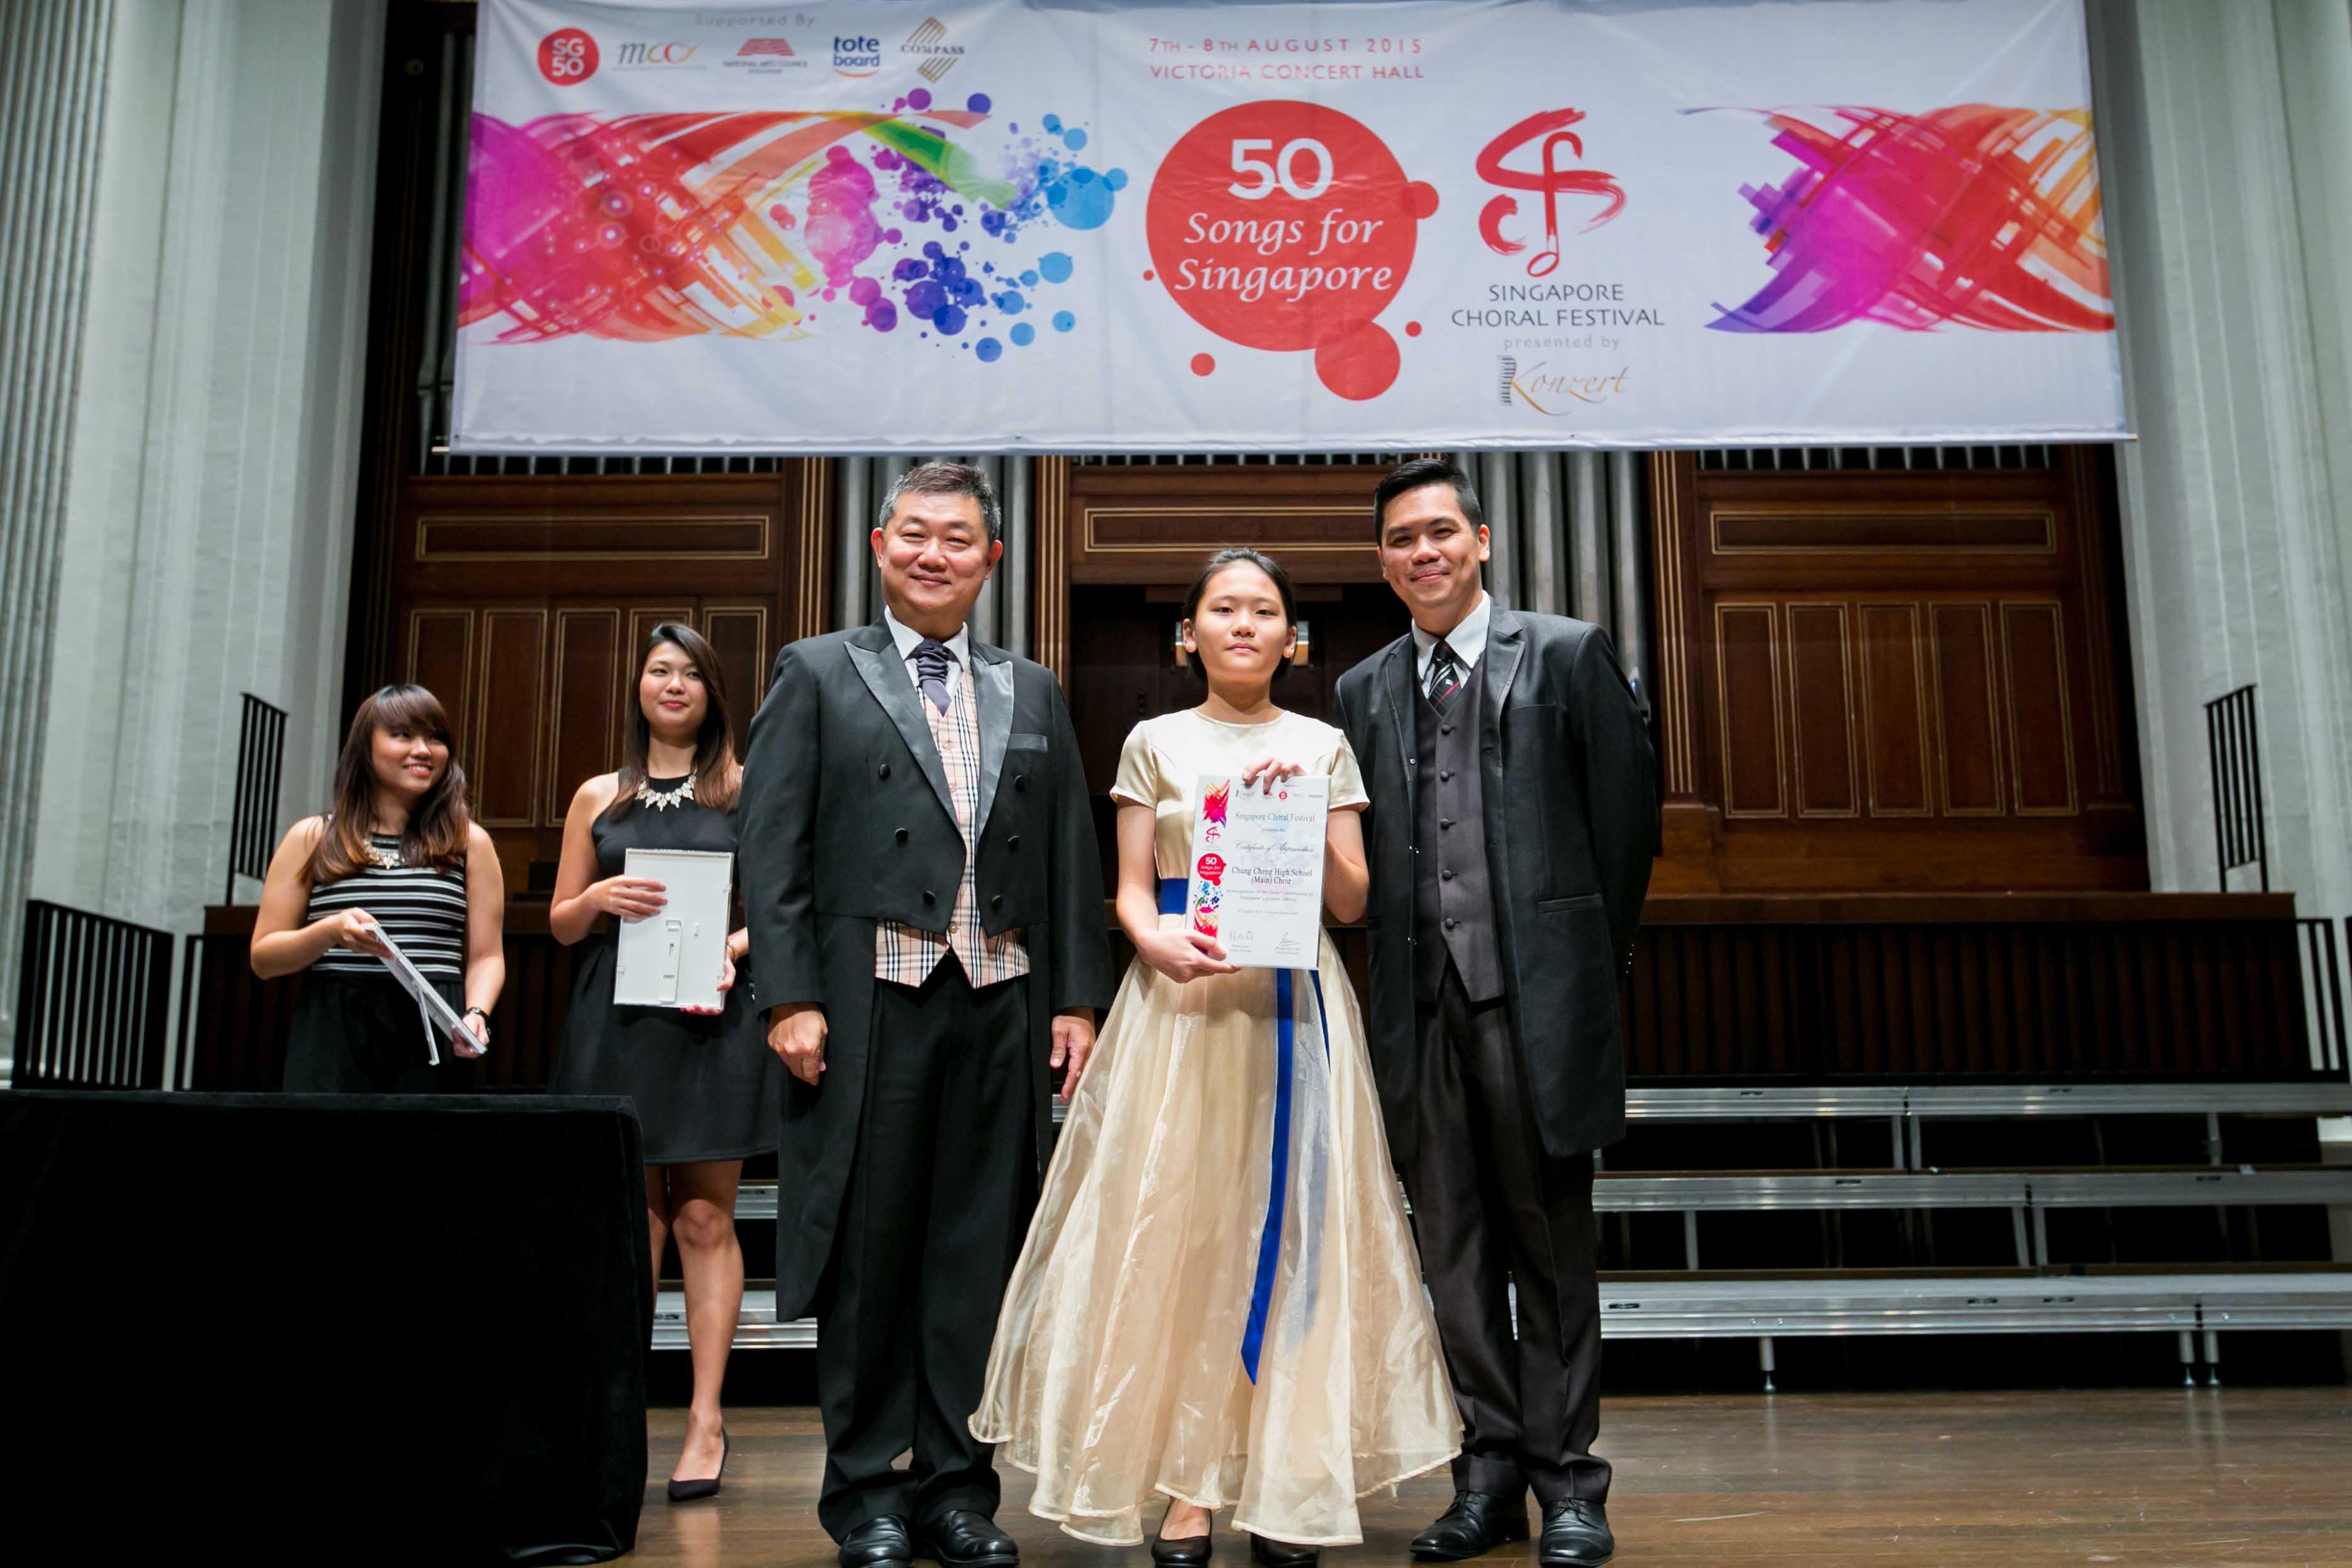 Singapore Choral Festival 8-8-15 (171).jpg